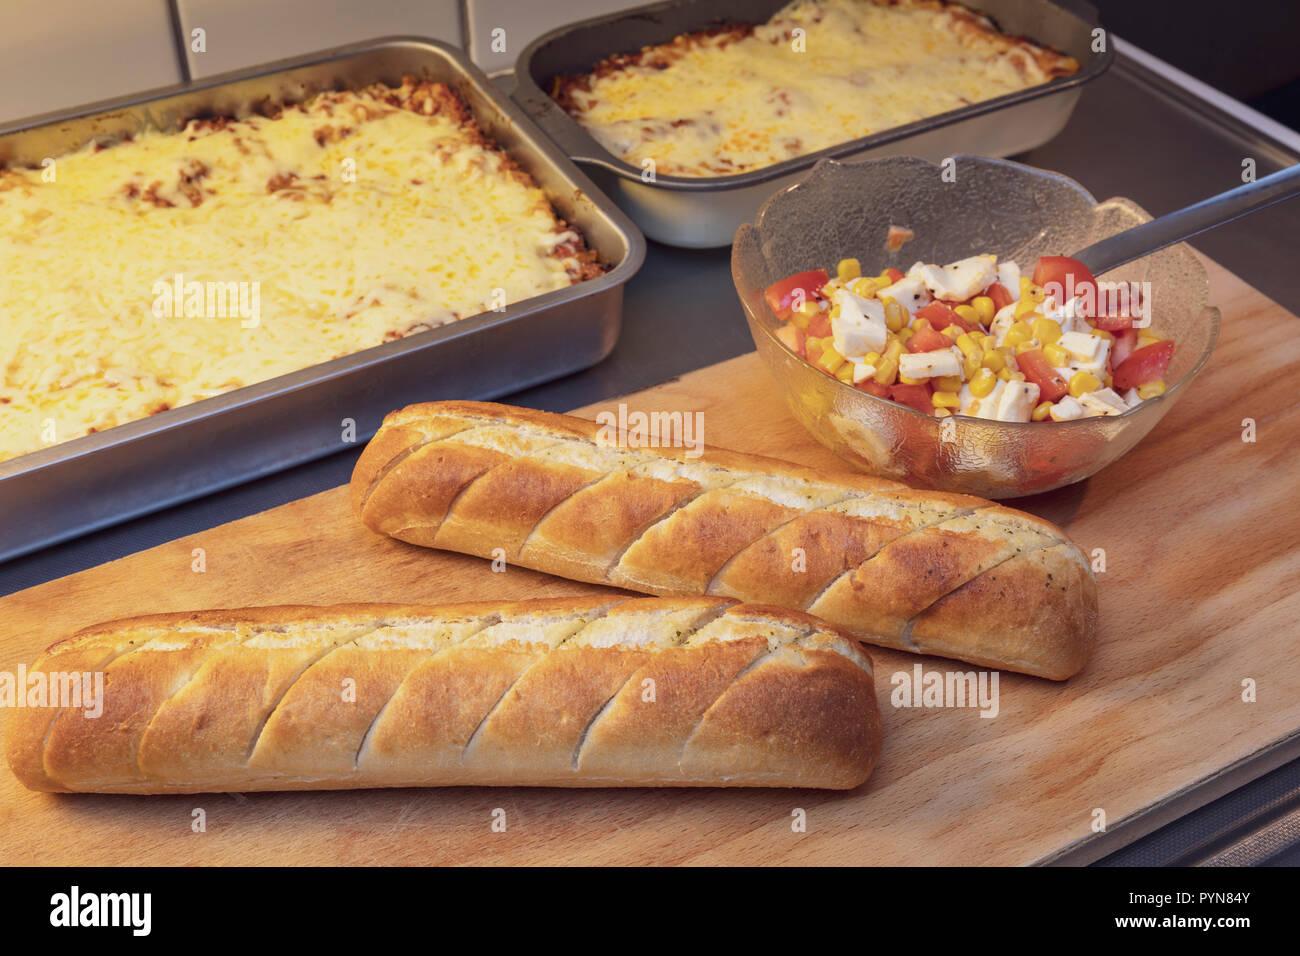 Close up view from above of cooked Lasagna al Forno and vegetarian Lasagna dinner wtih salad and garlic bred - Stock Image